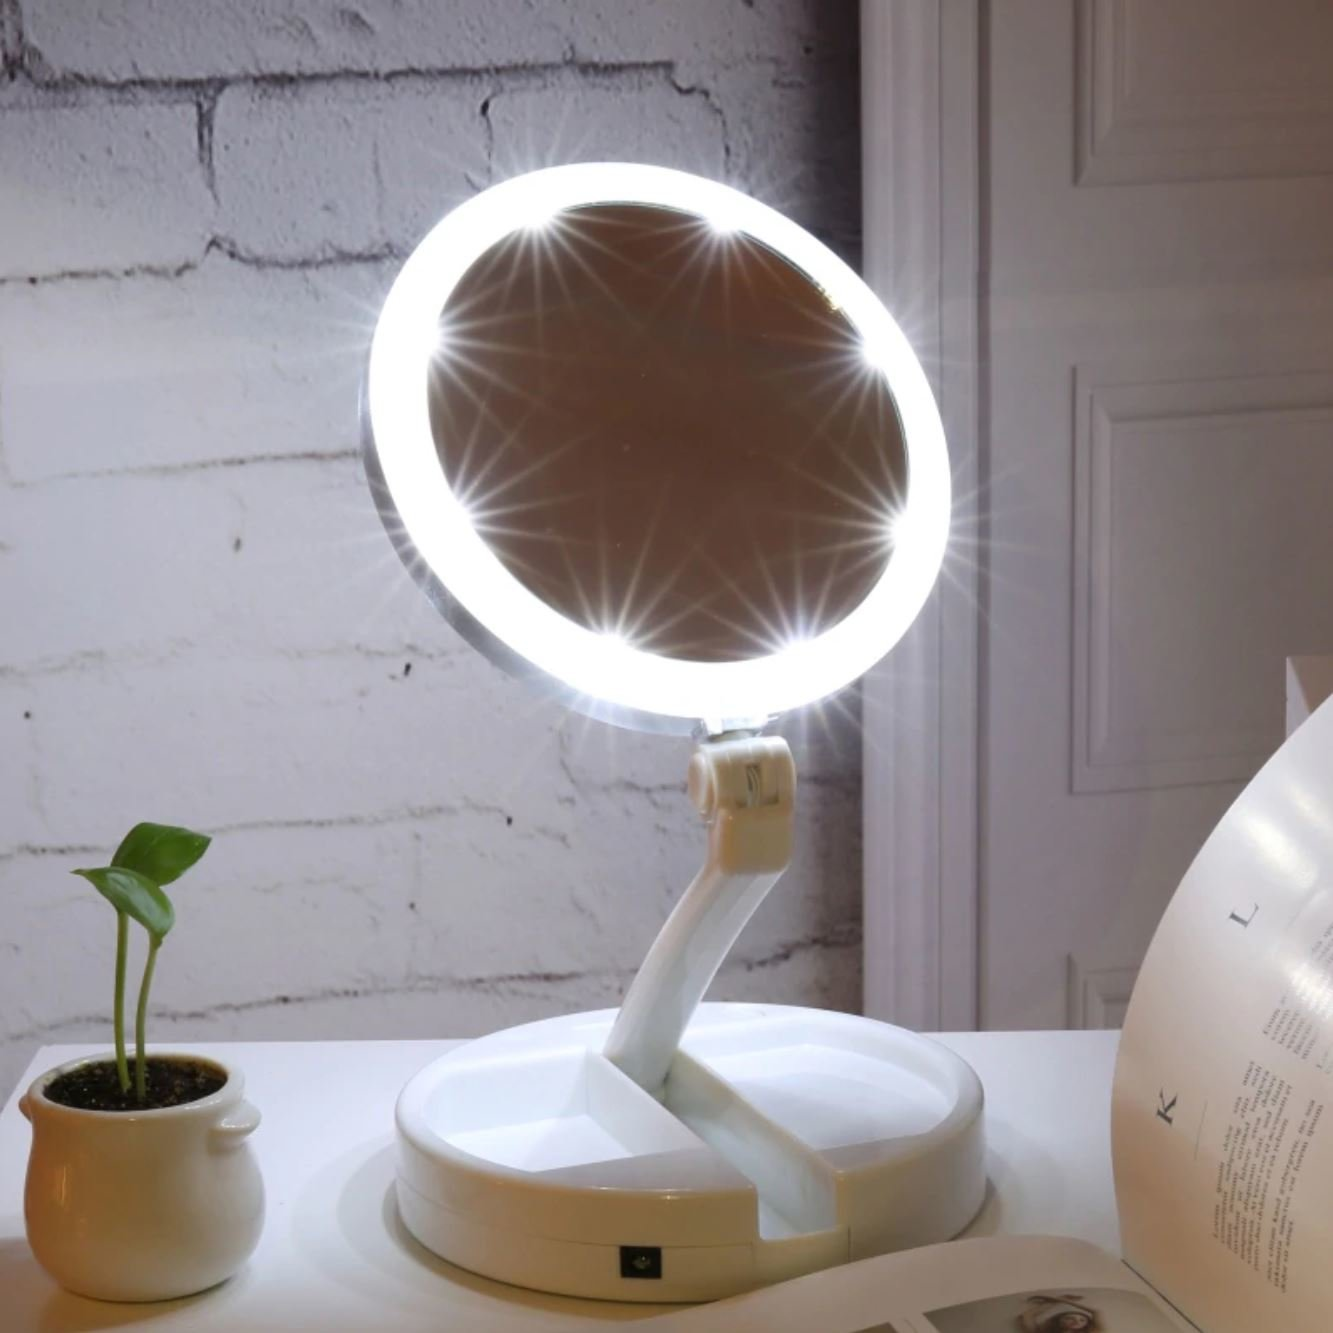 Зеркало со светодиодной подсветкой My FoldAway Mirror